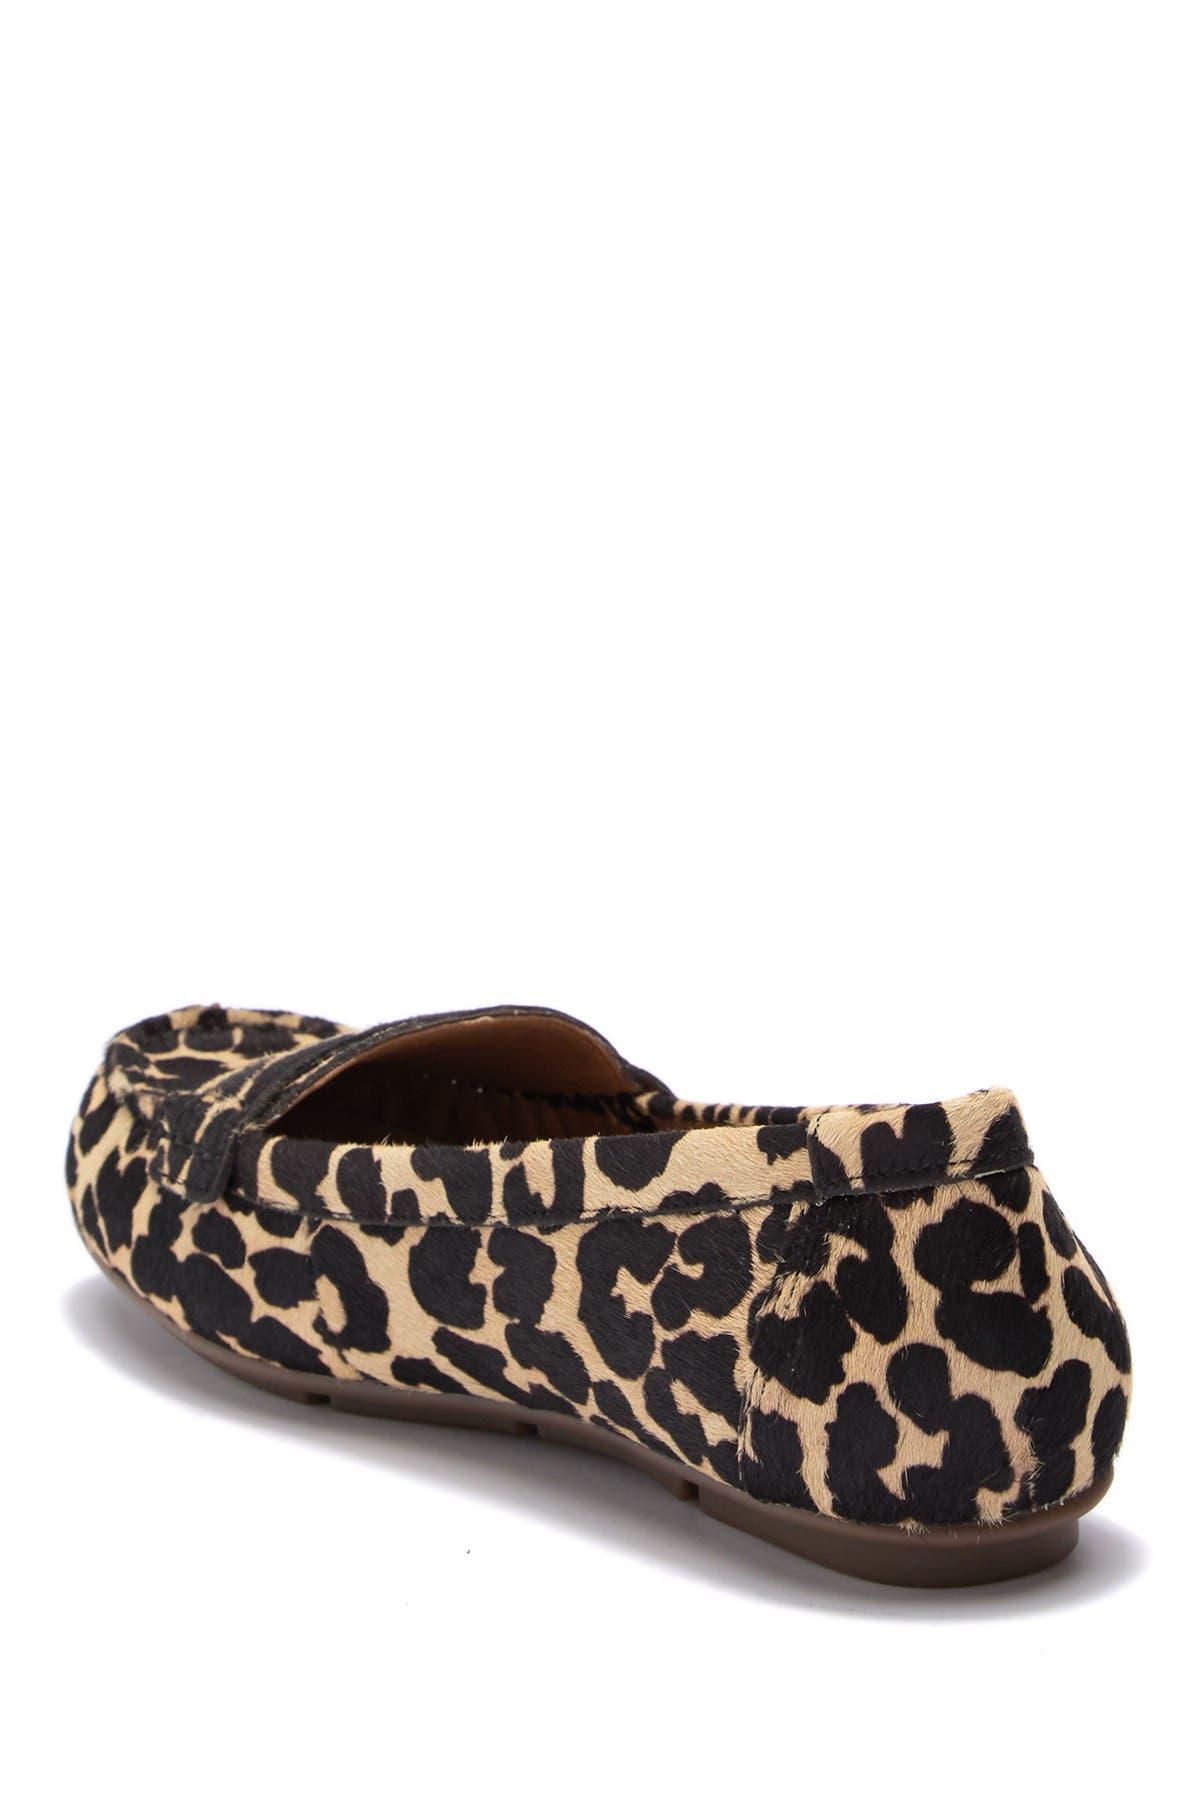 Vionic | 356 Larrun Leather Loafer